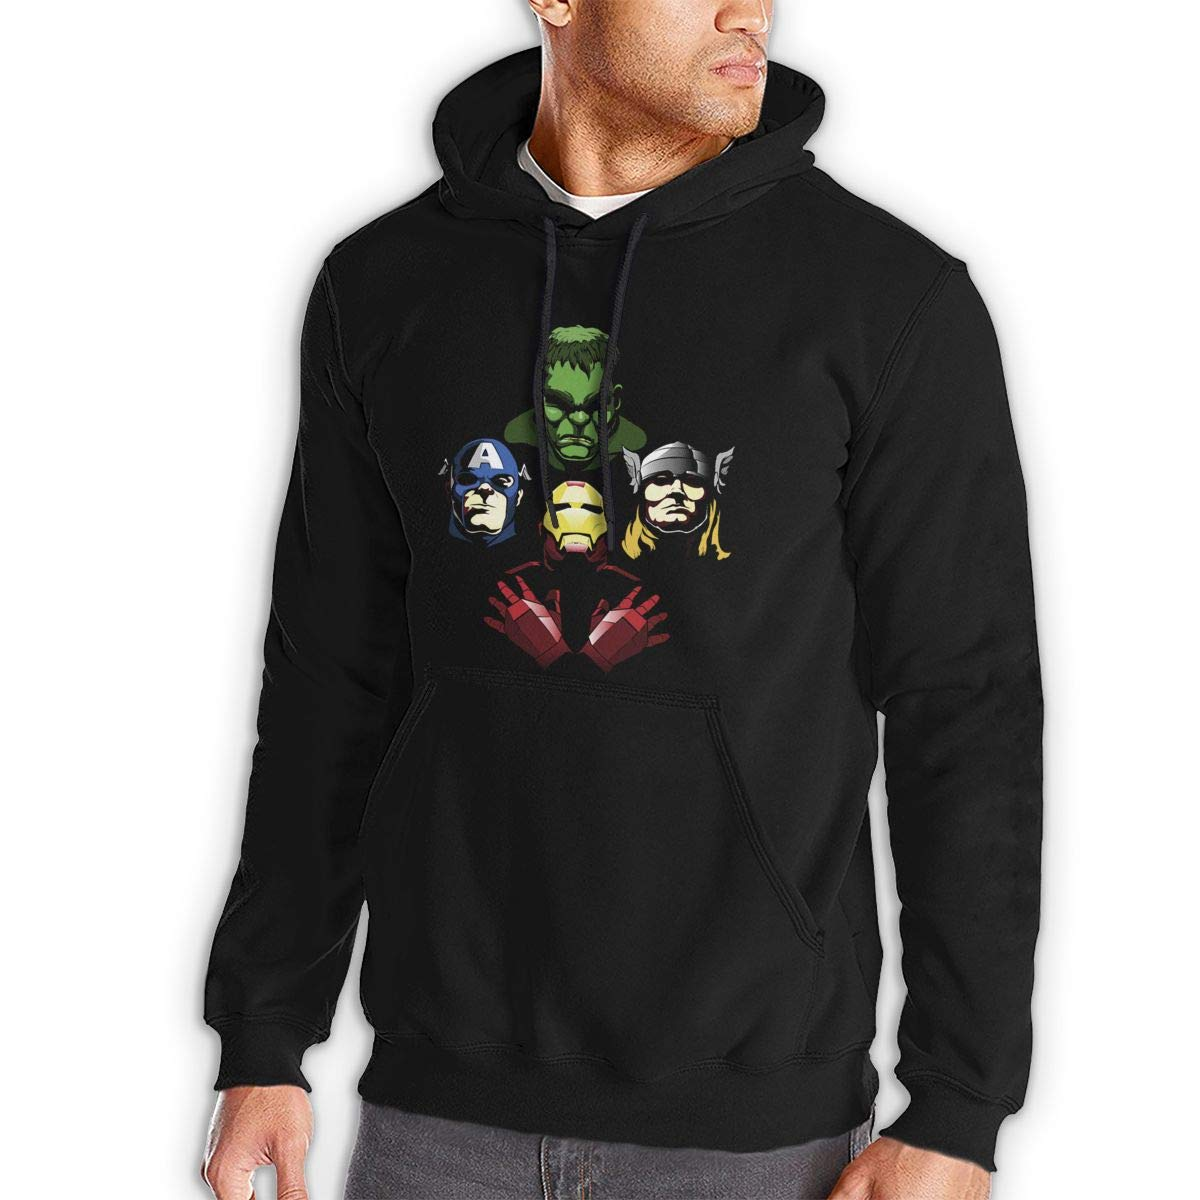 Avengers Rhapsody,Autumn and Winter Sweater Mens Hooded Jacket Kangaroo Pocket Sports Hoodies Black